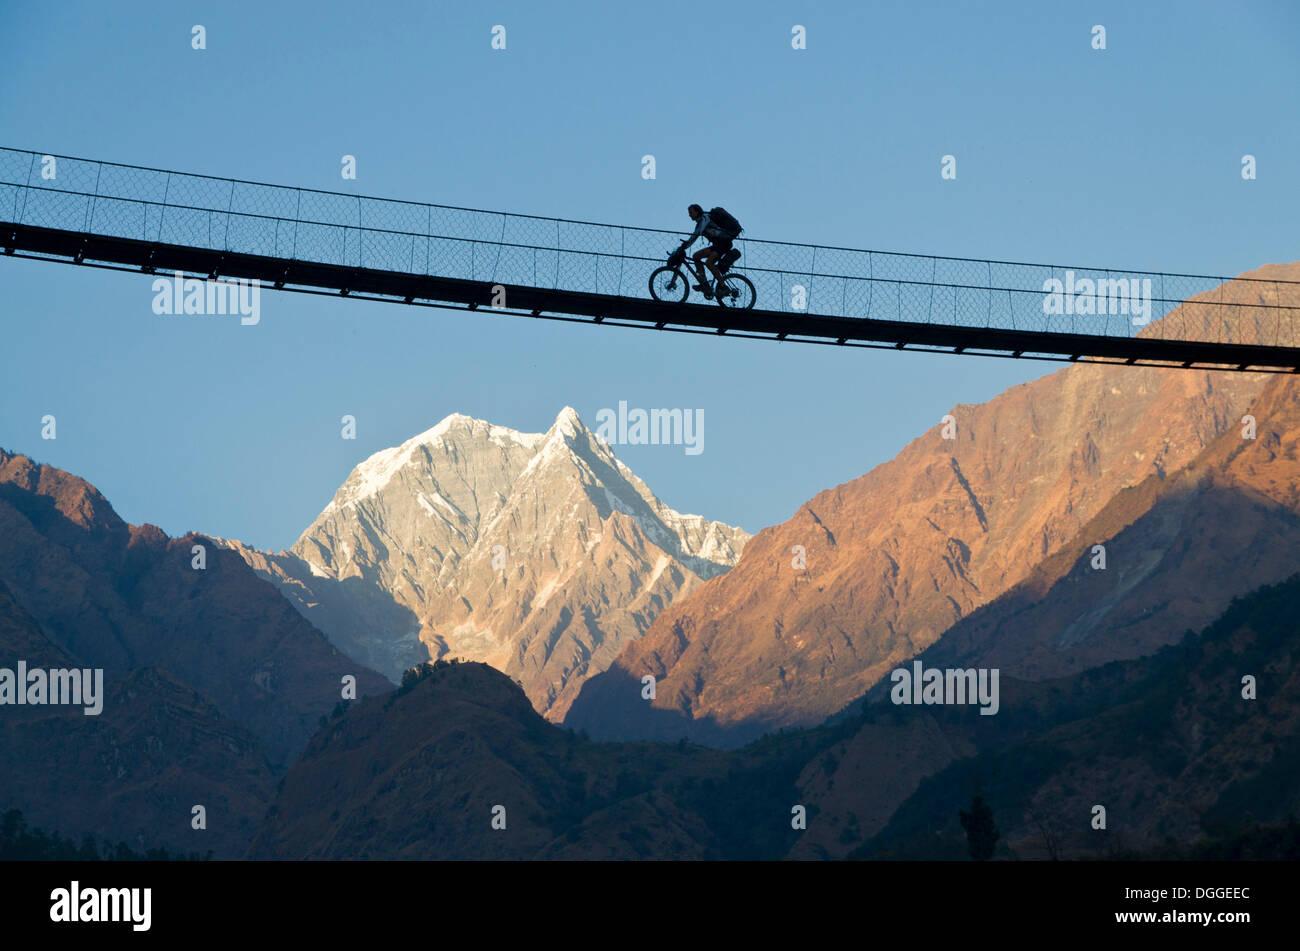 Cyclist crossing a suspension Bridge over Kali Ghandaki Valley, Nilgiri Mountain in the back, Tatopani, Annapurna Region, Nepal - Stock Image